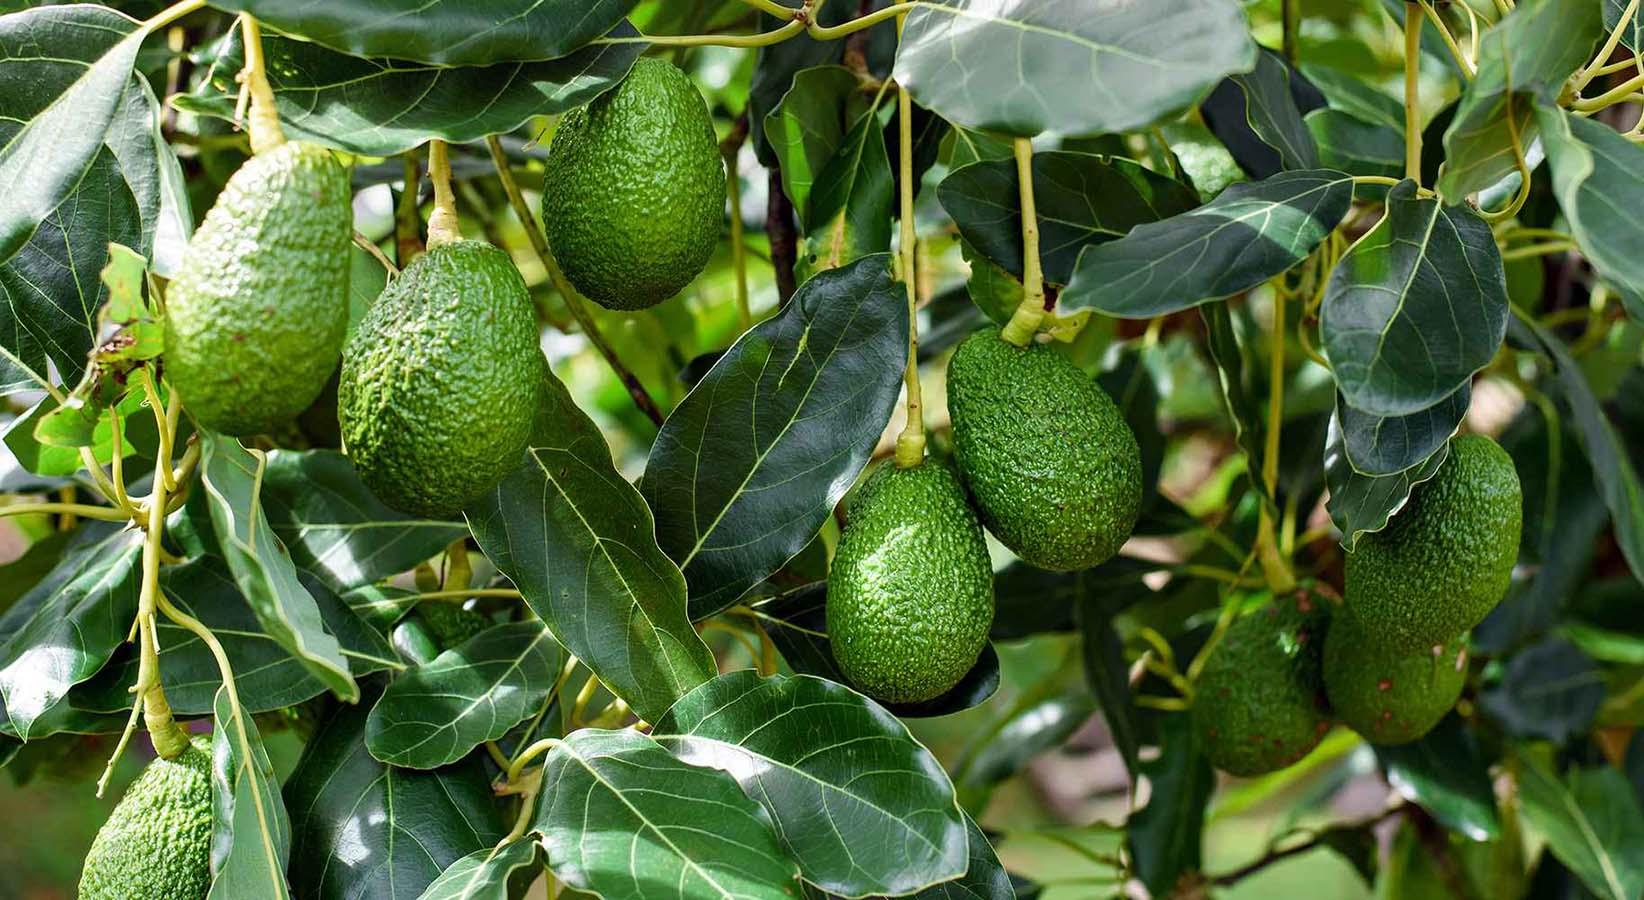 AVOCADO HELLAS- ΕΛΛΑΔΑ αβοκαντο δεντρο φυτο τιμη καρπος καλλιεργεια